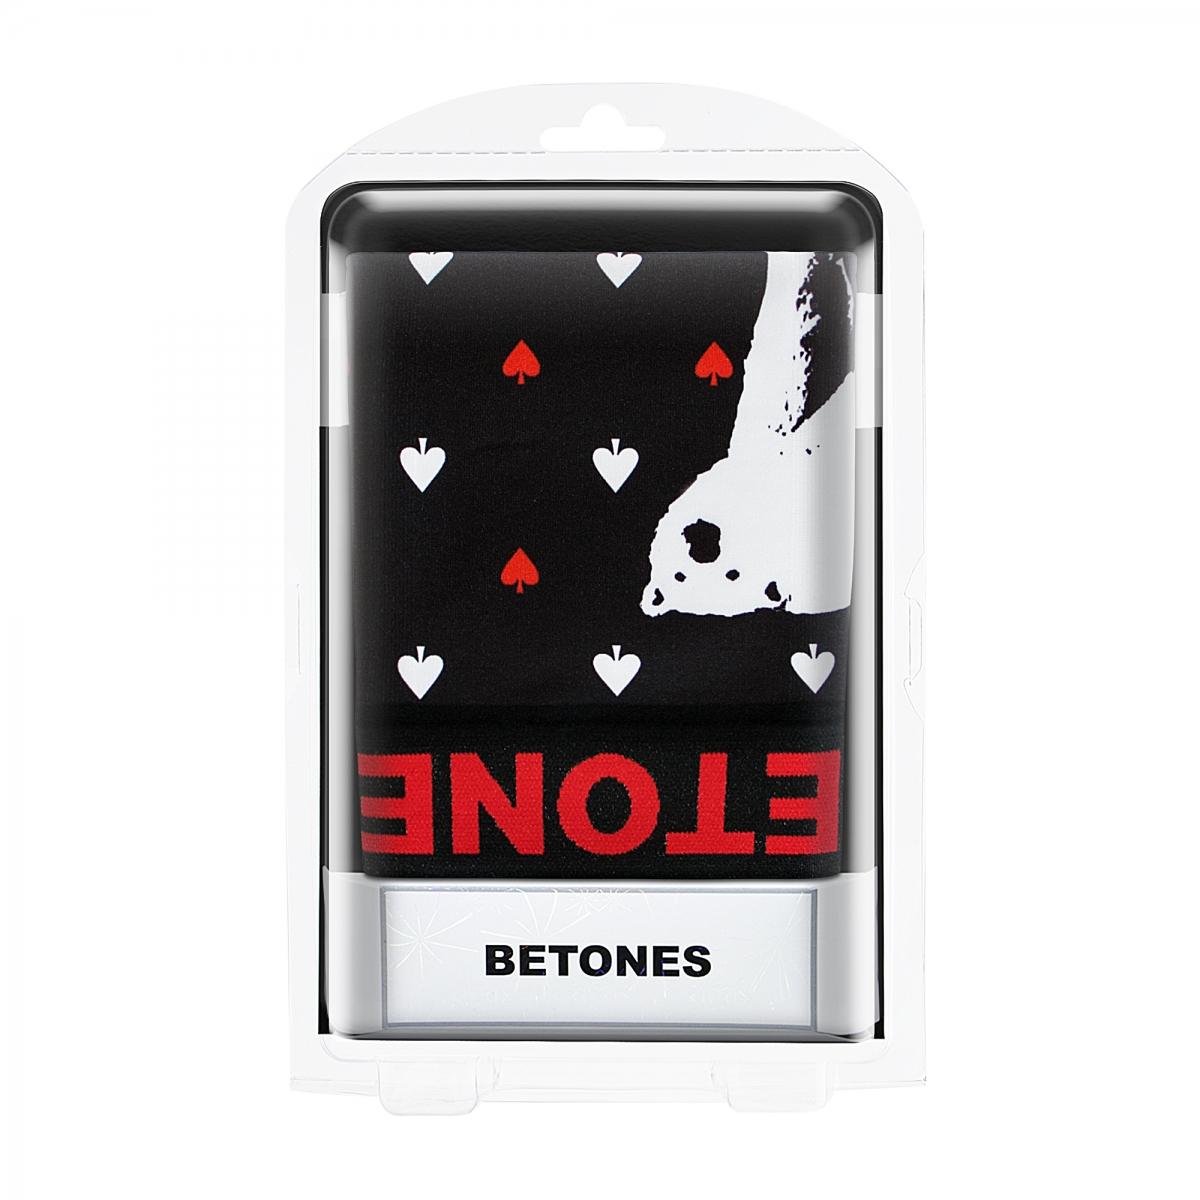 BETONES ビトーンズ ボクサーパンツ ANIMAL4 D004 POLAR BEAR BLACK